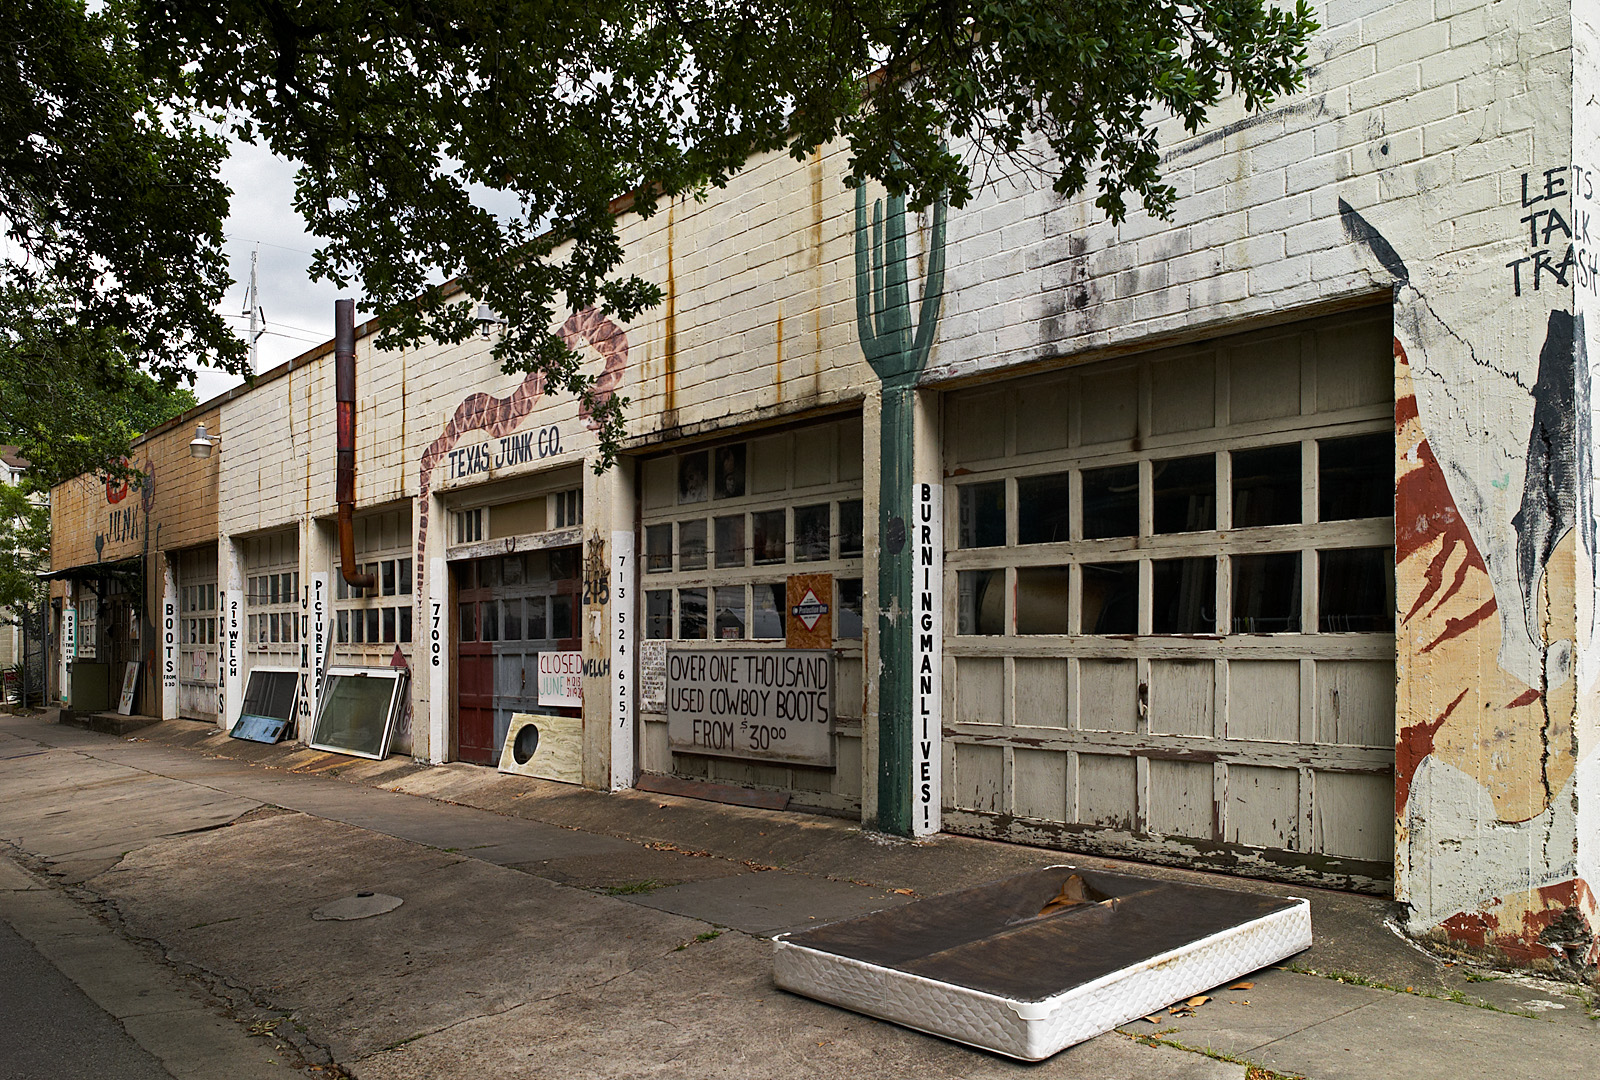 Texas Junk Co